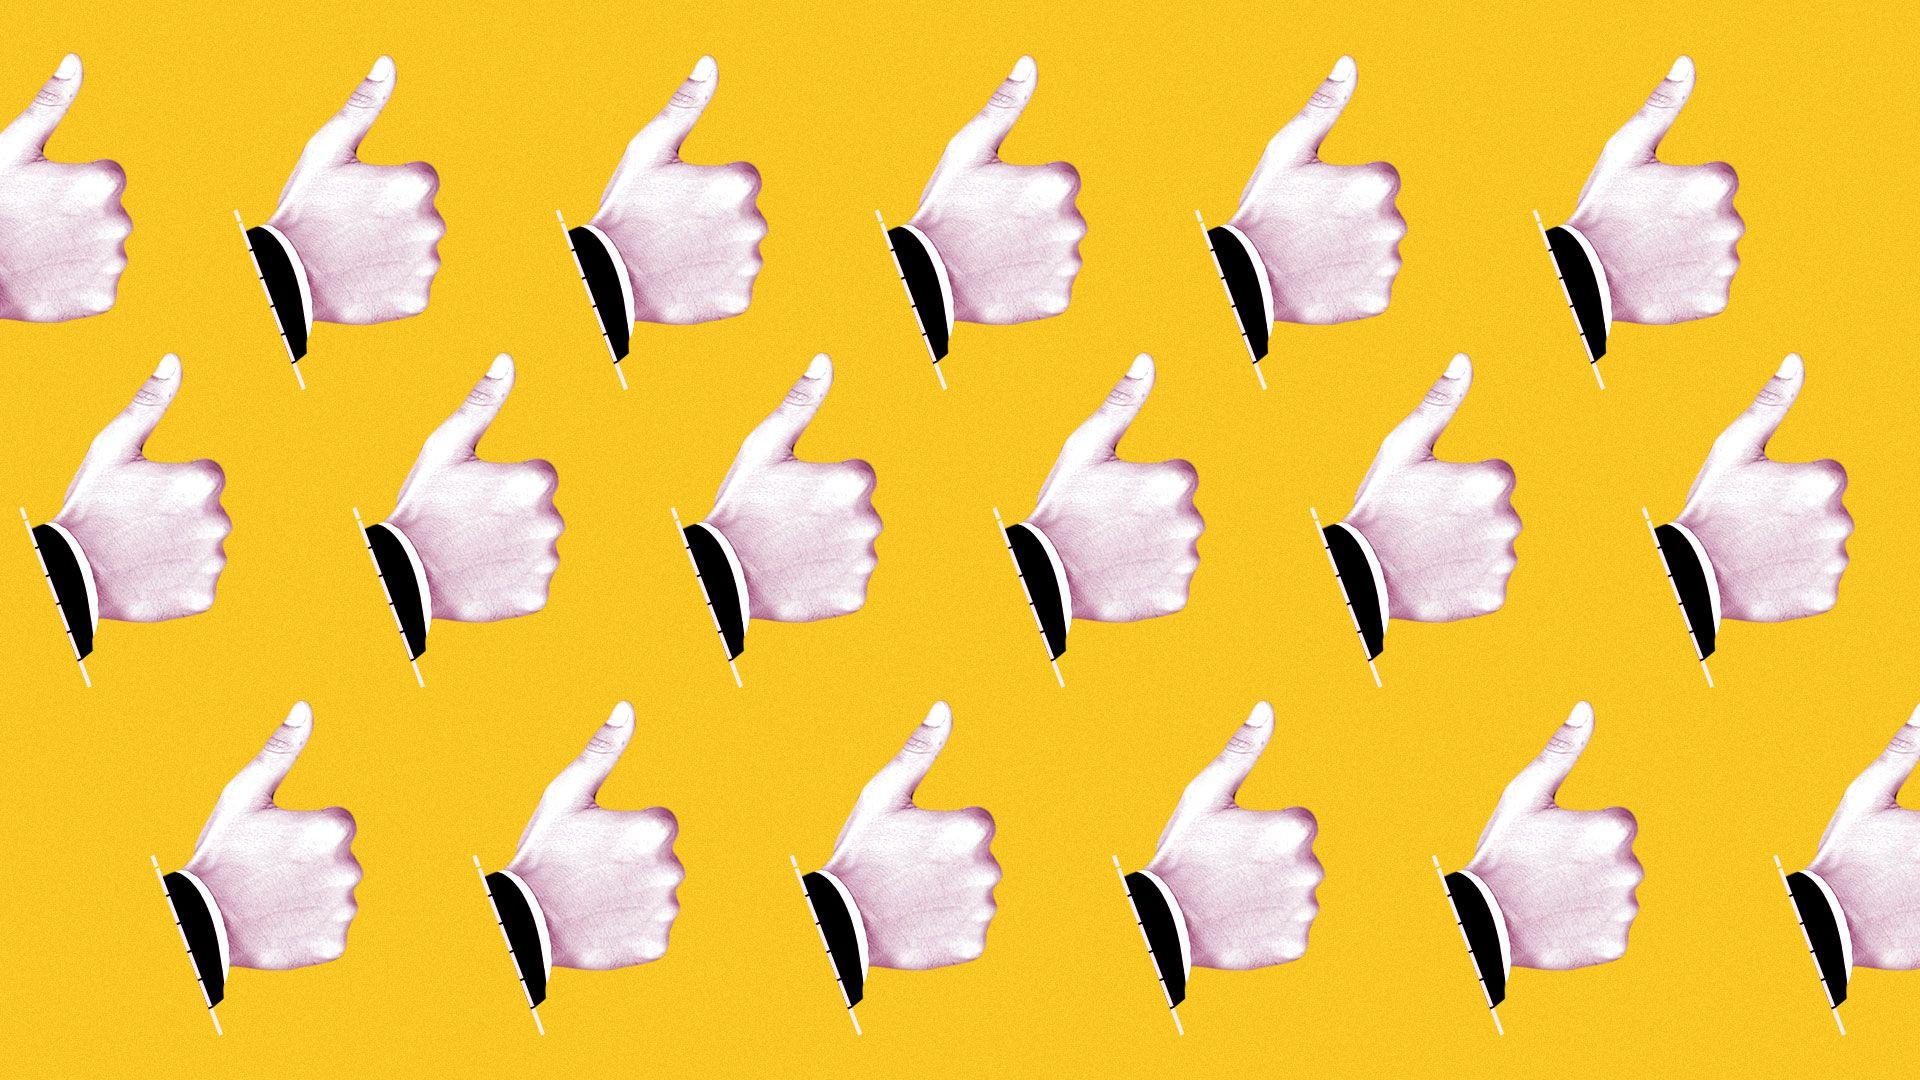 Illustration of thumbs up pattern.